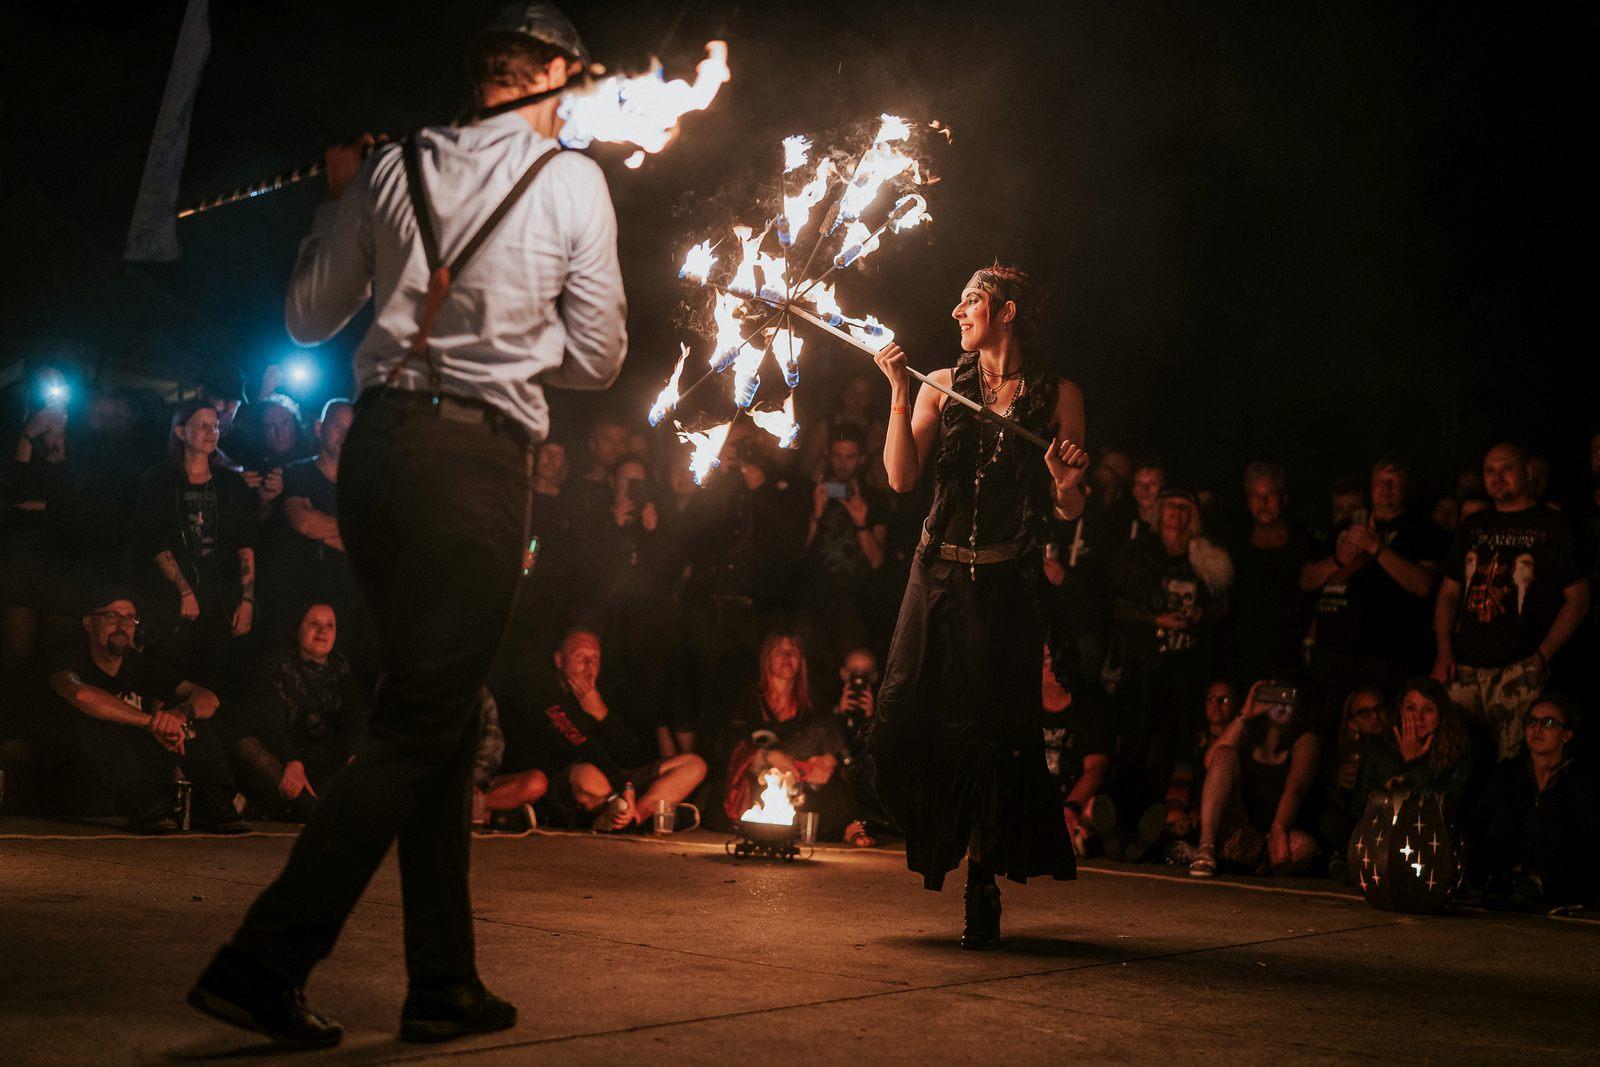 Feuertheater Hildesheim, M'era Luna Festival 2019, Foto: Robin Schmiedebach